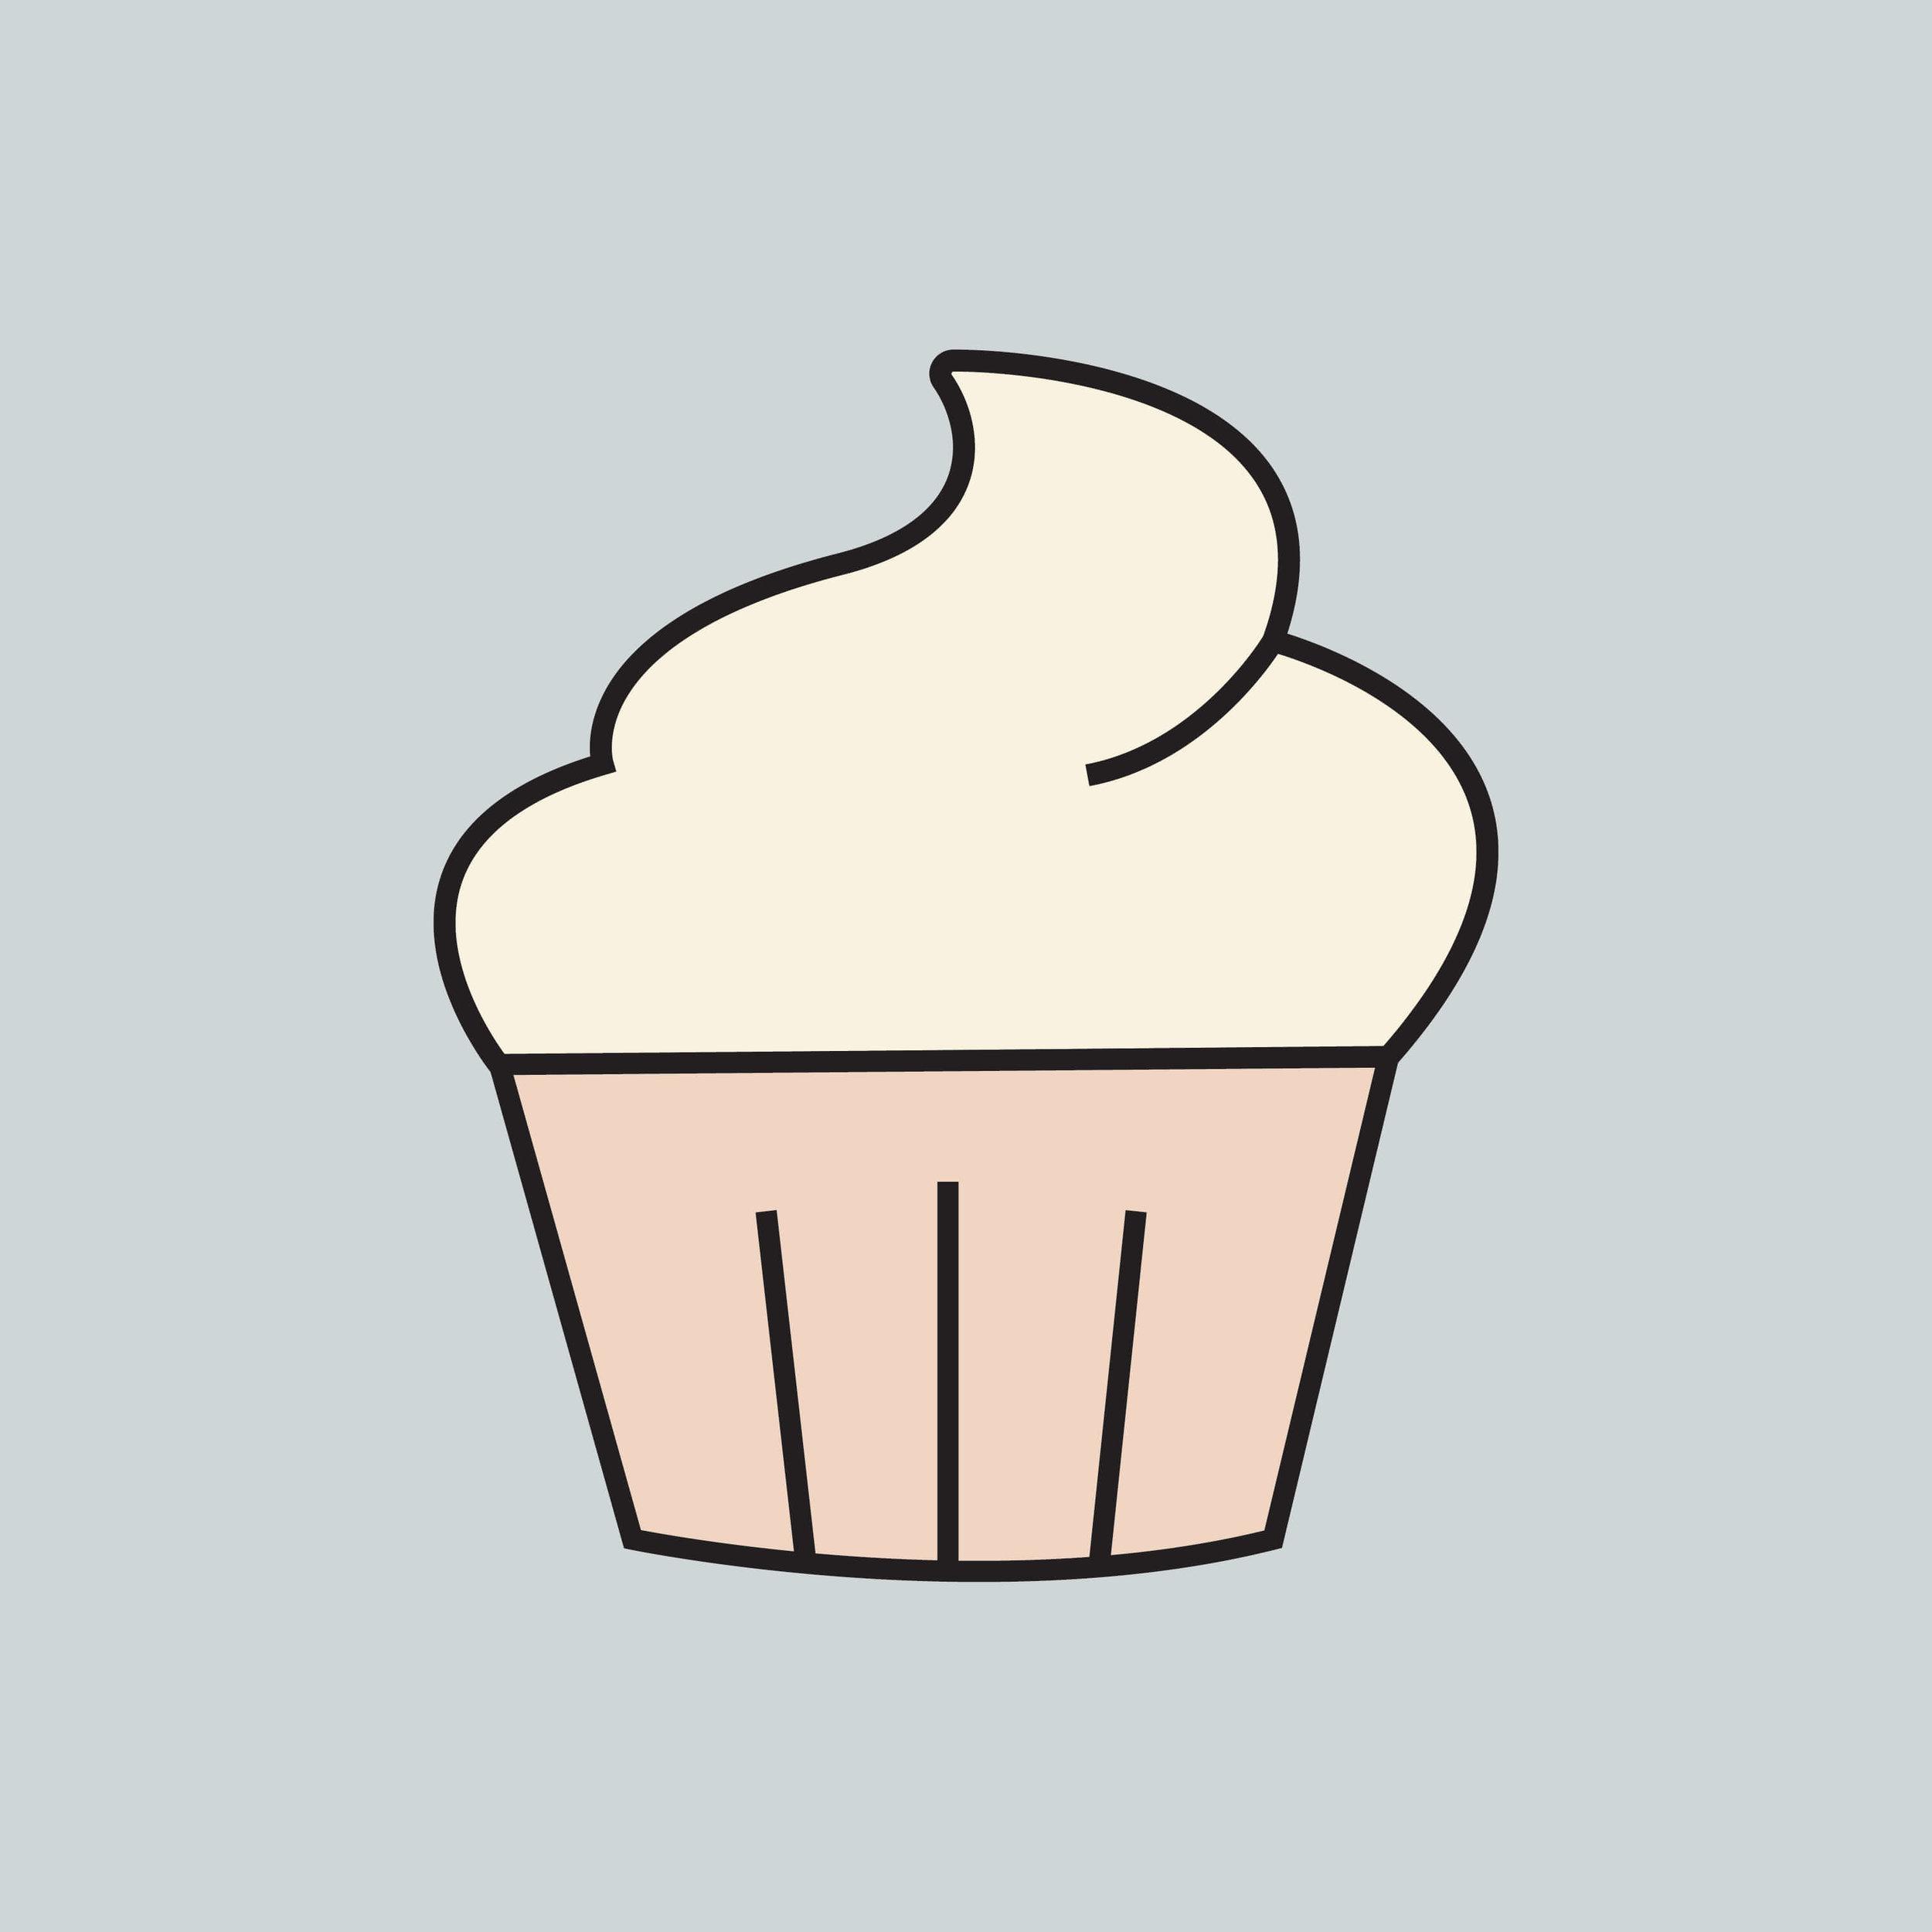 Classic Vanilla Cupcake